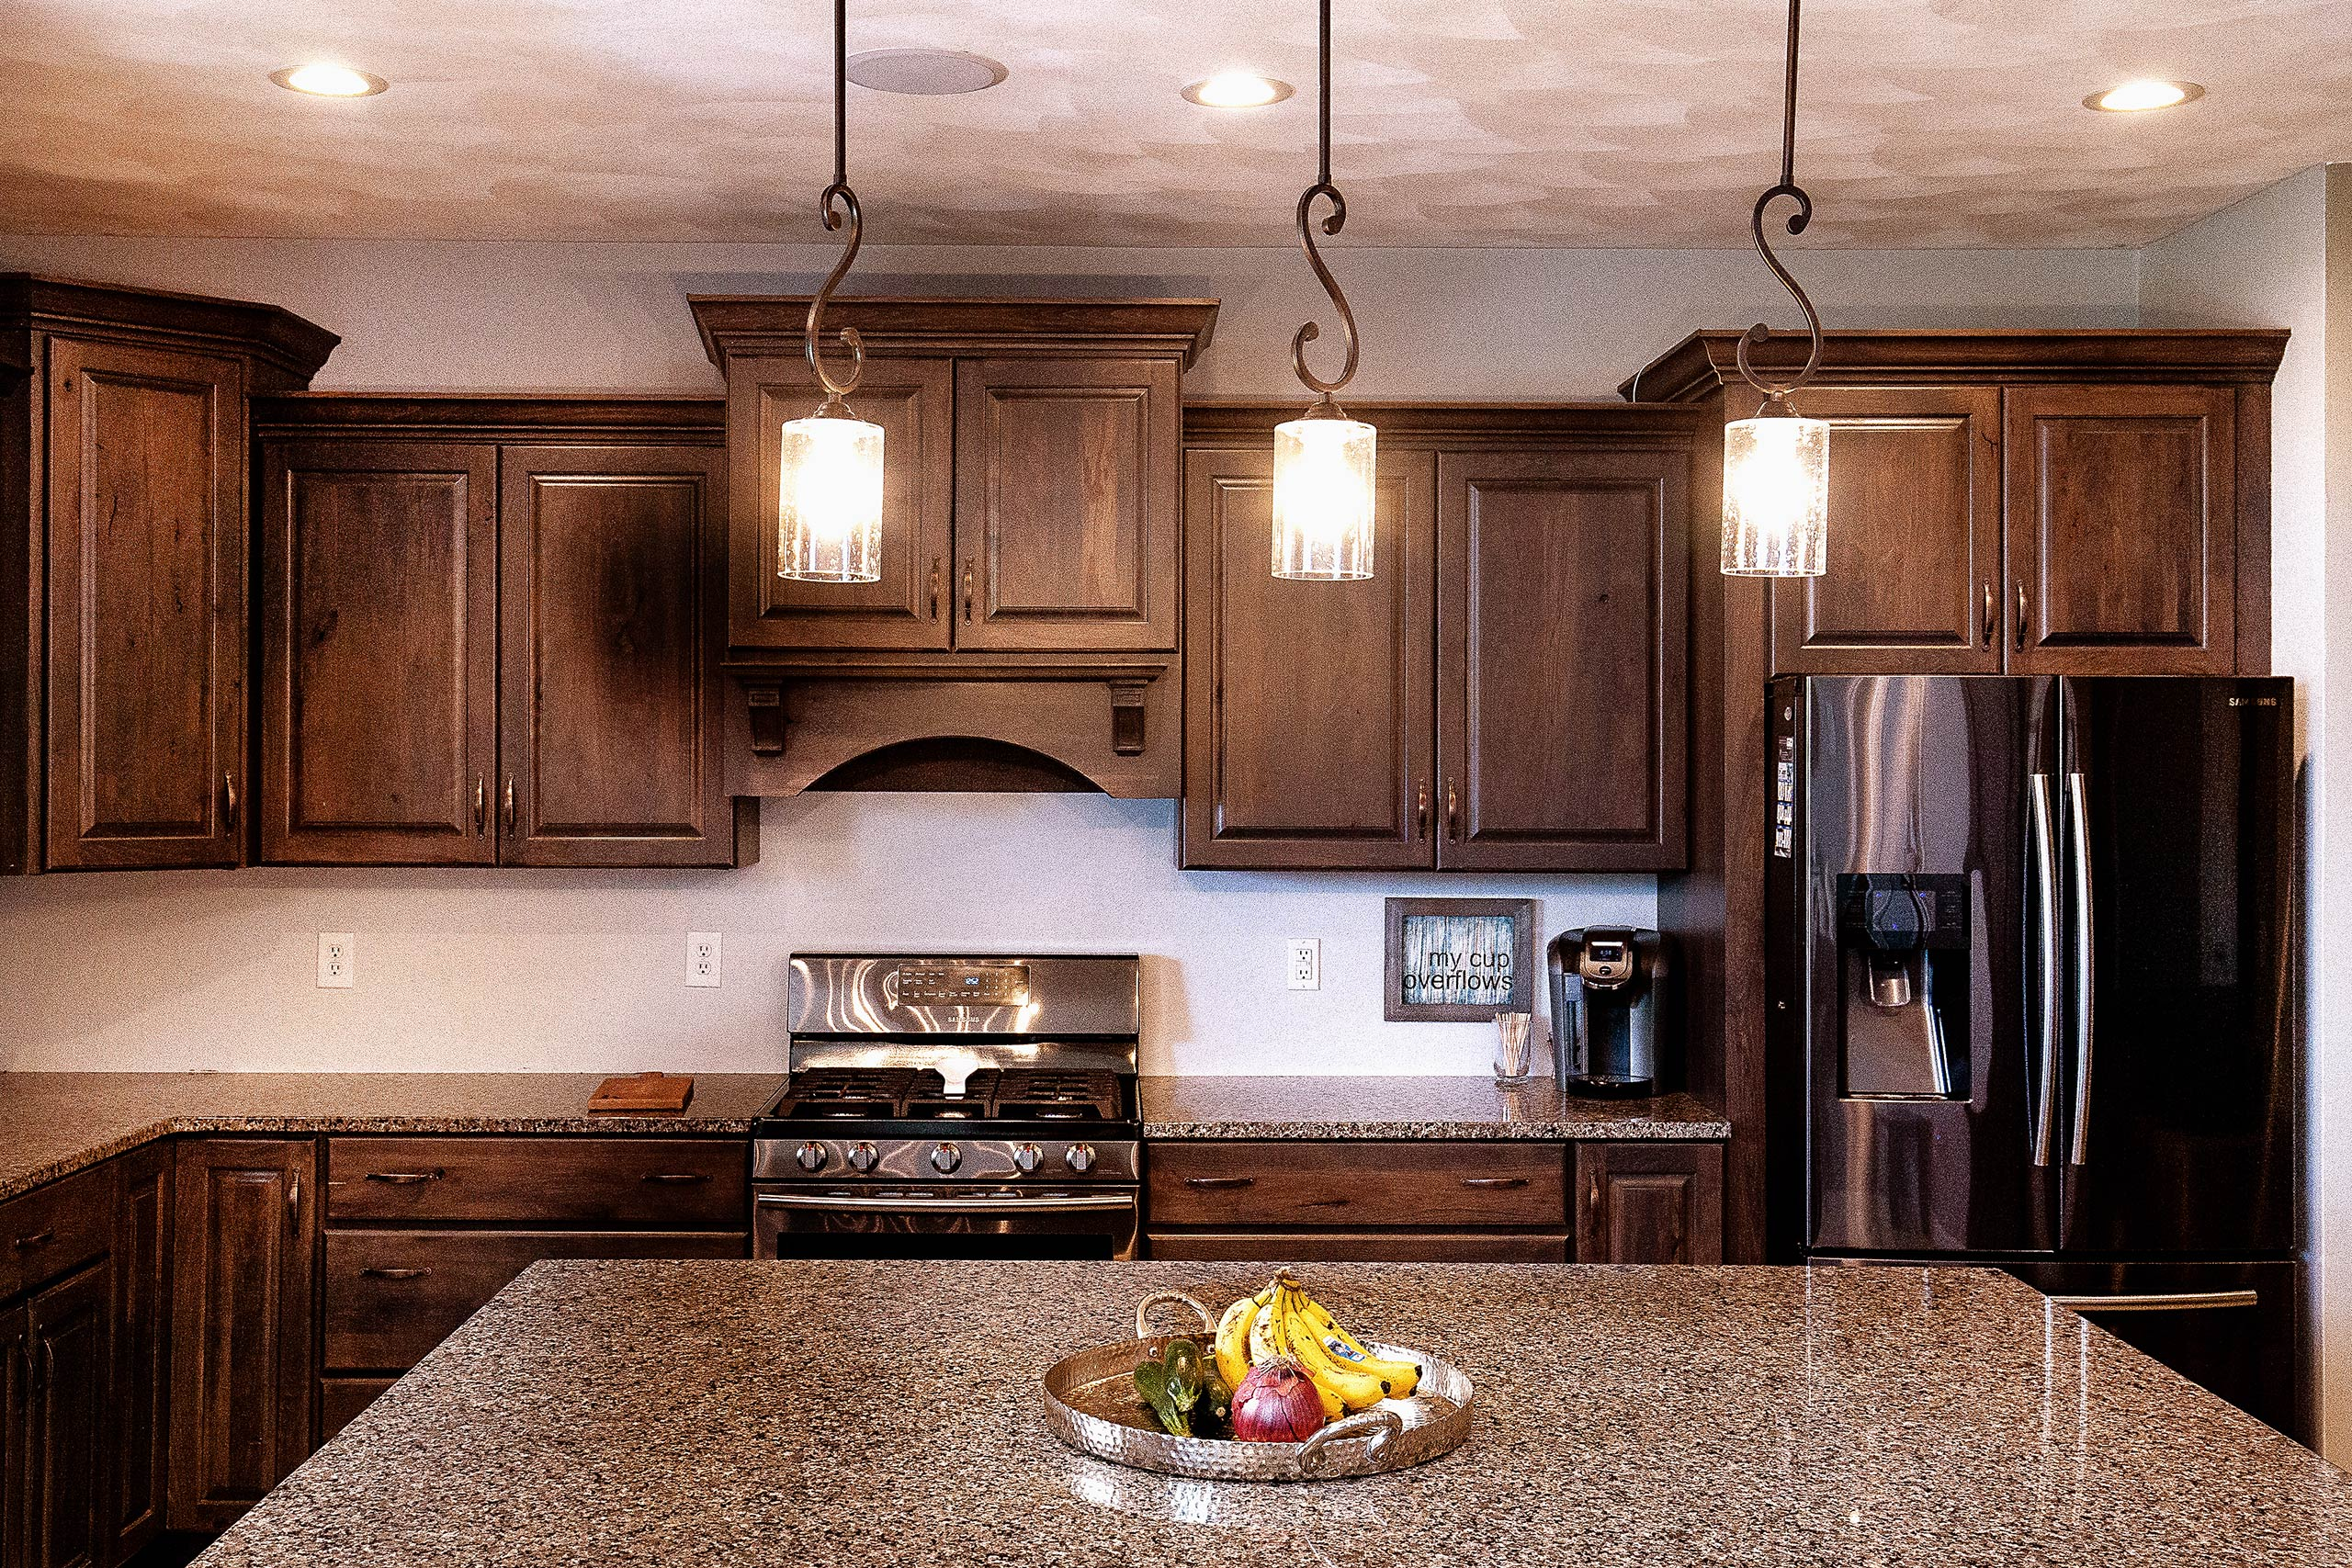 Kitchen Cabinets | Columbia IL 62236